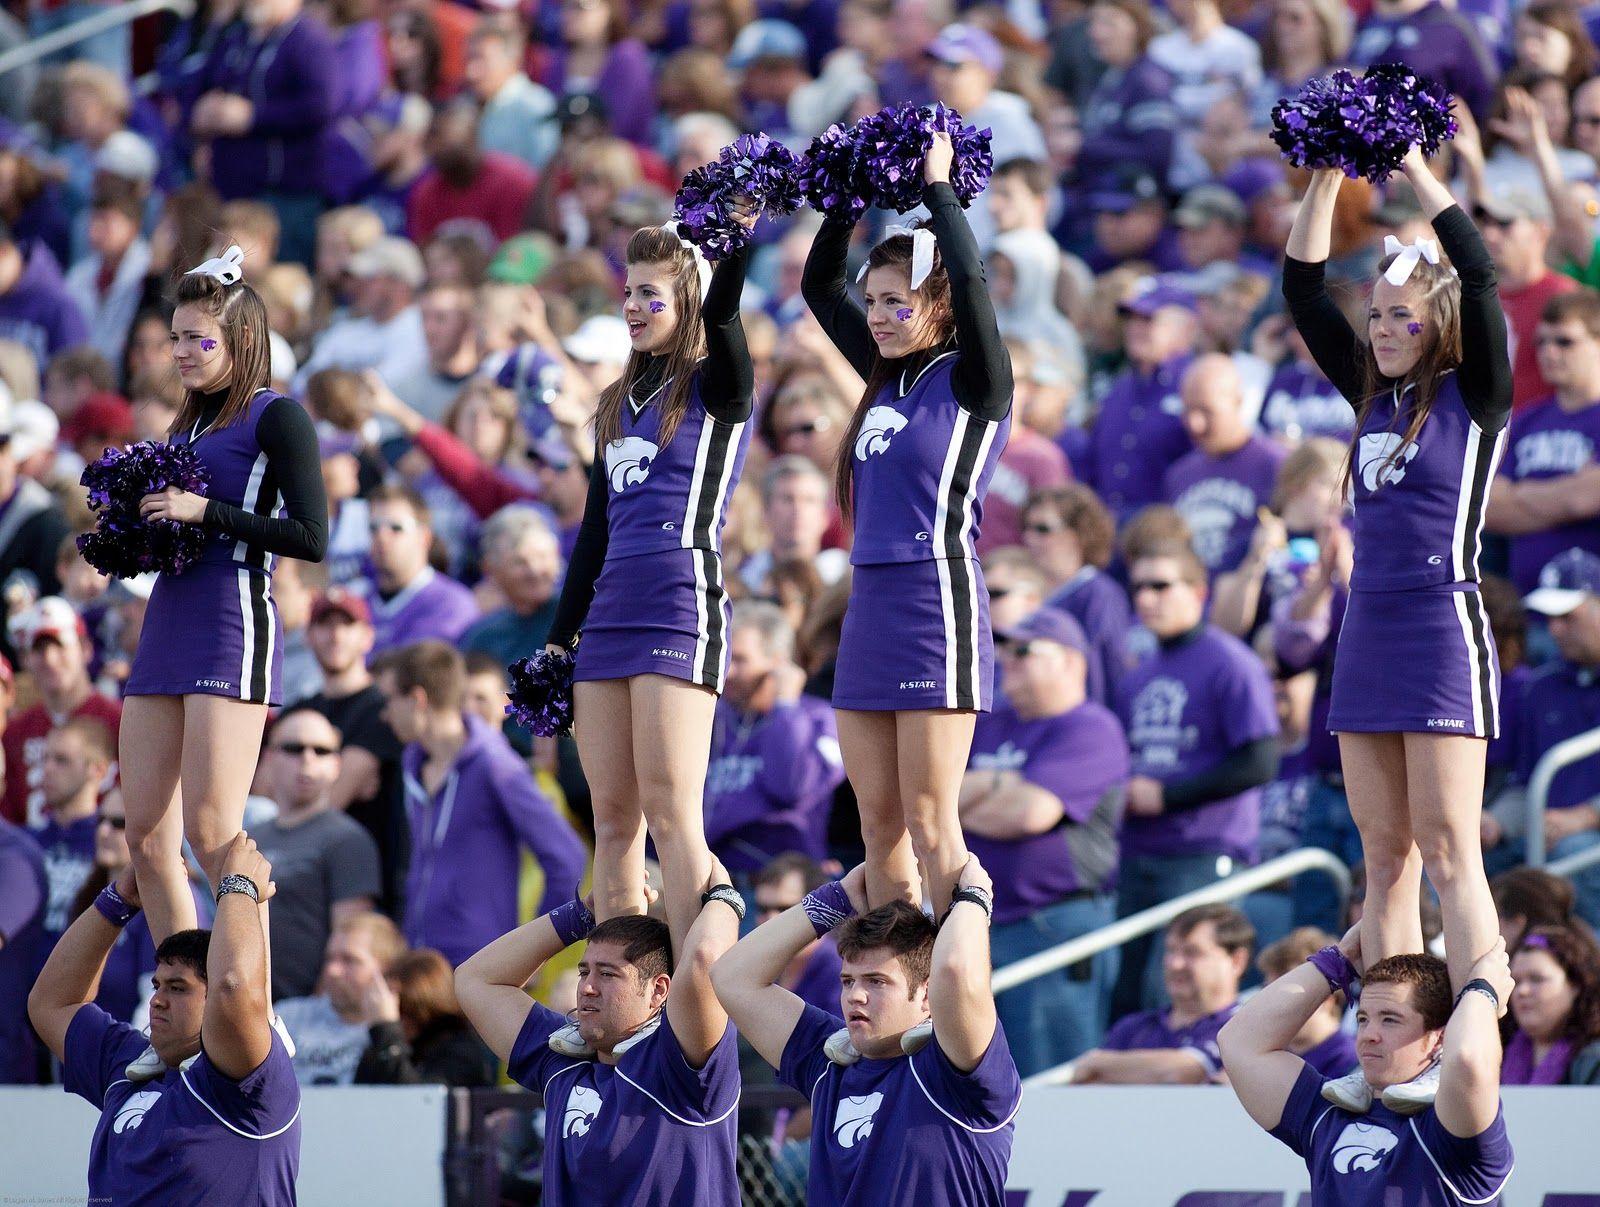 Kansas State University Kansas State Football Cheerleaders Cheerleading Pictures